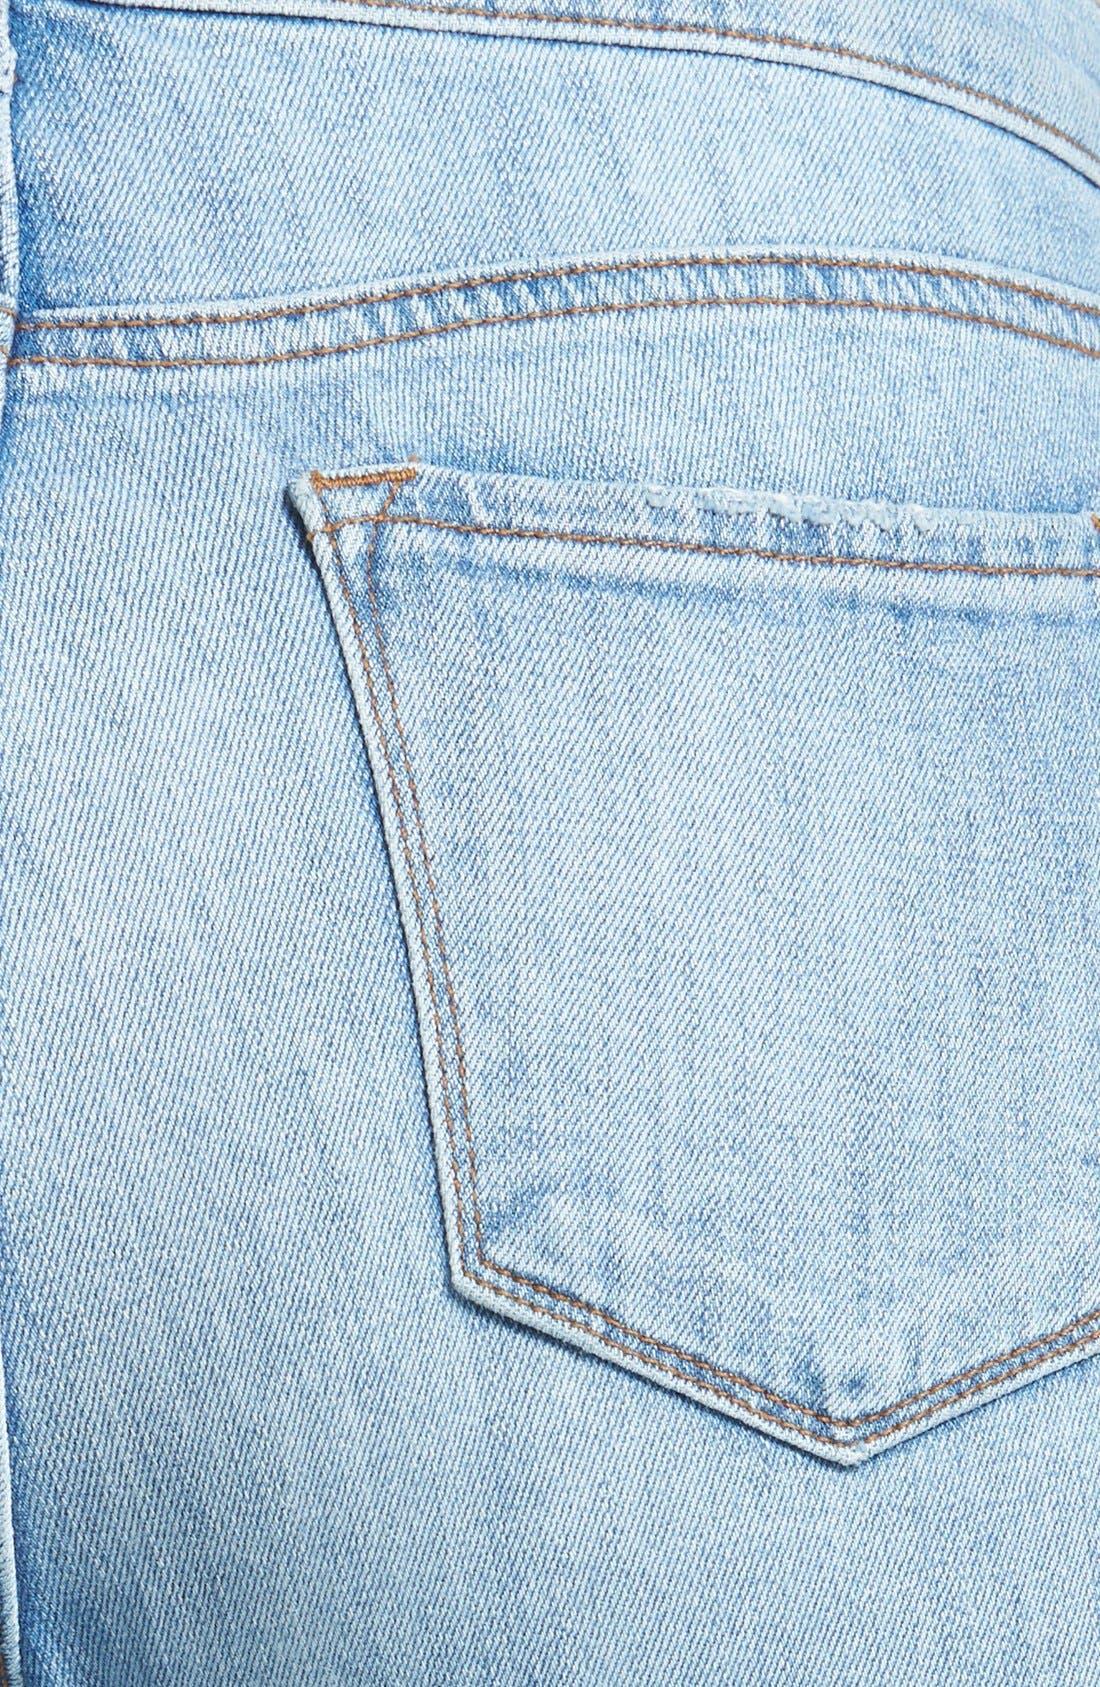 Alternate Image 3  - J Brand 'Jake' Skinny Boyfriend Jeans (Eternal)